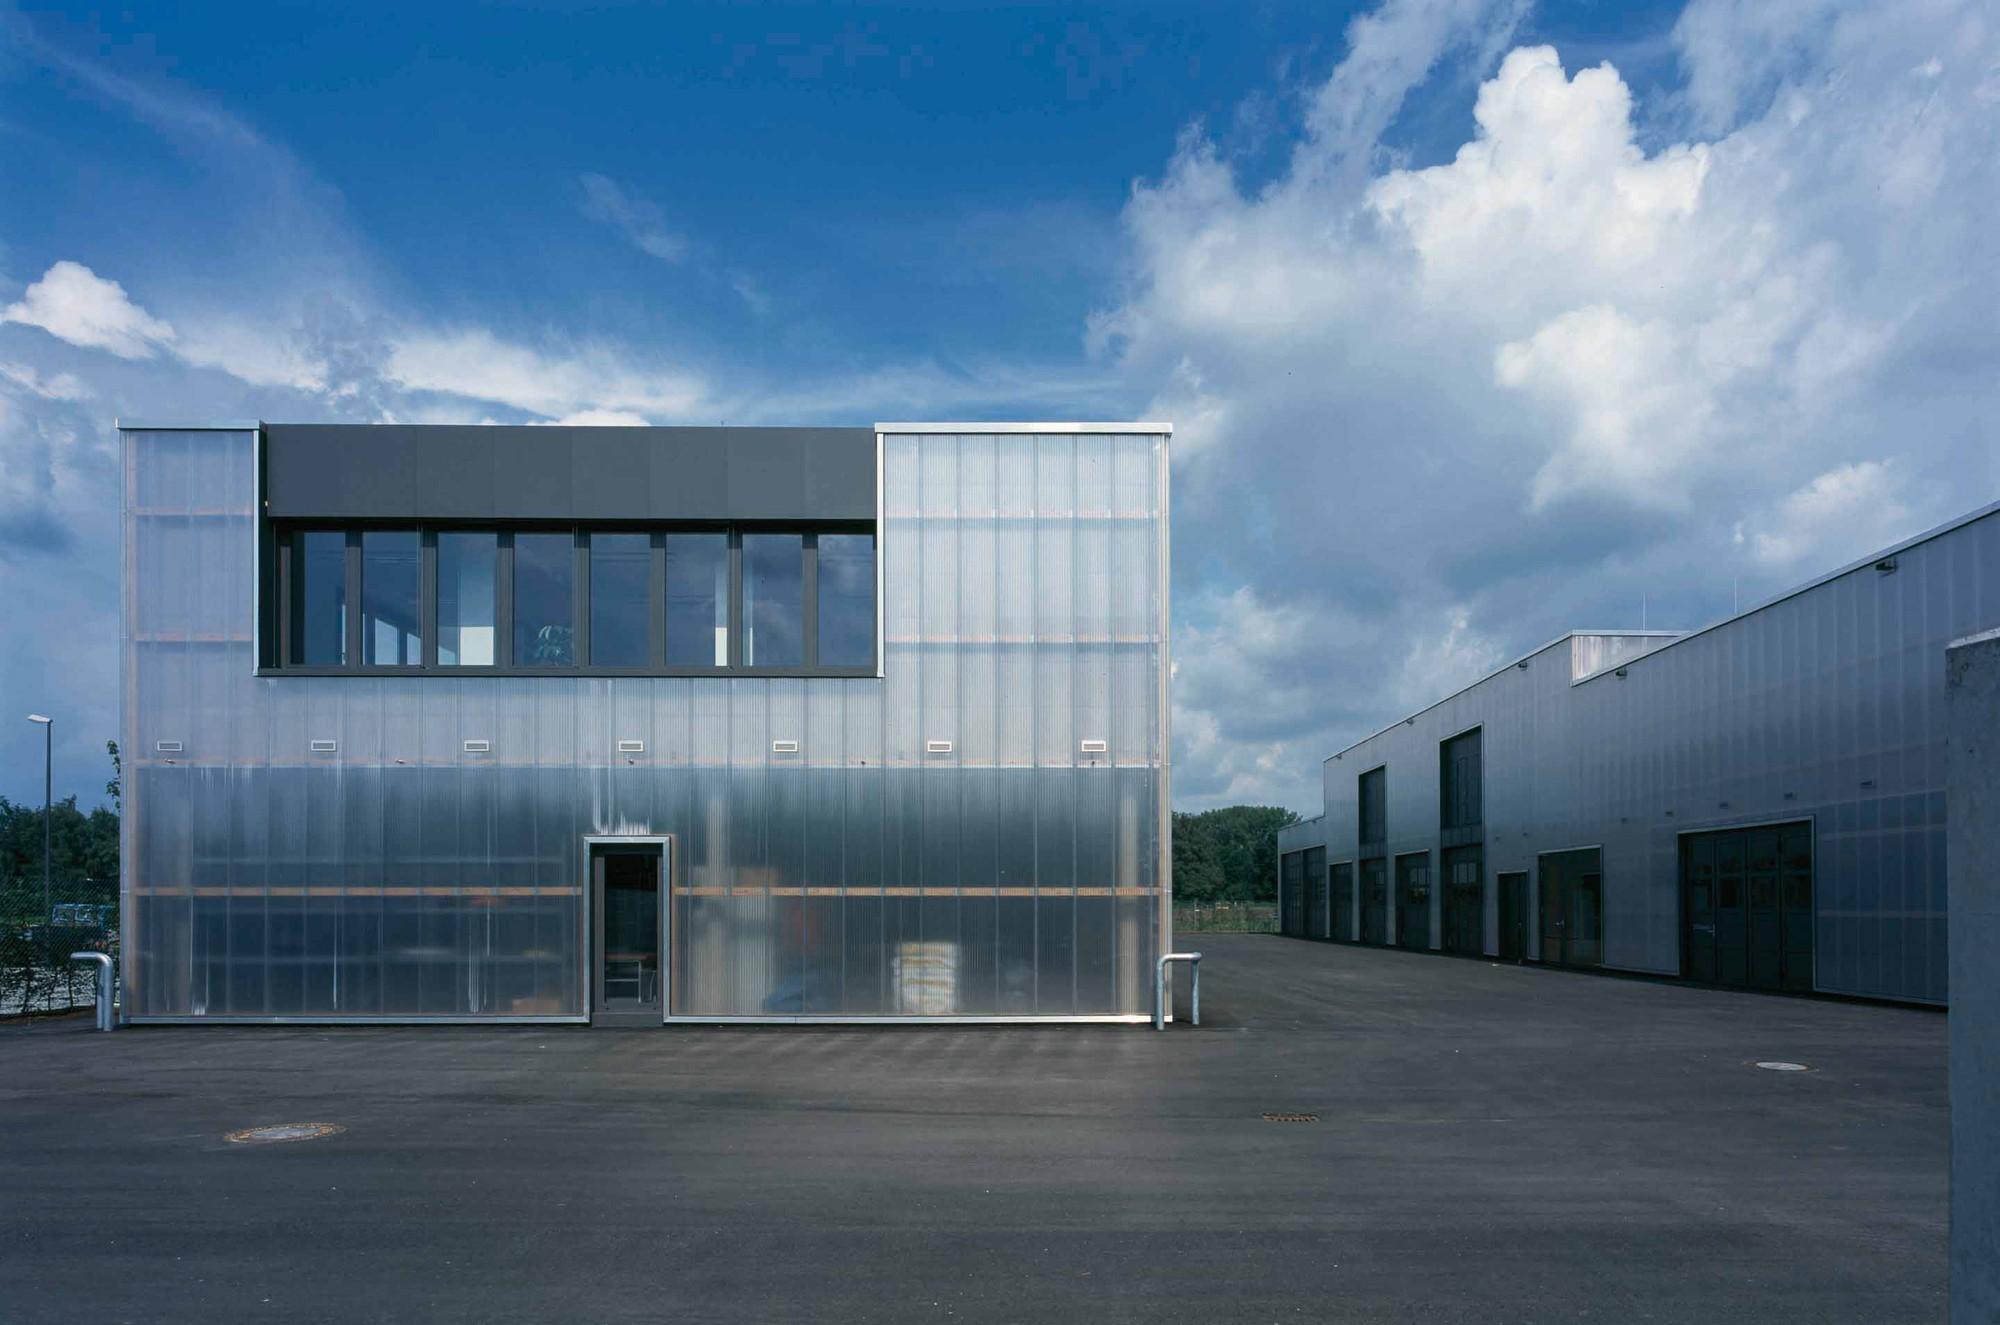 maintenance facility allmann sattler wappner architekten archdaily. Black Bedroom Furniture Sets. Home Design Ideas